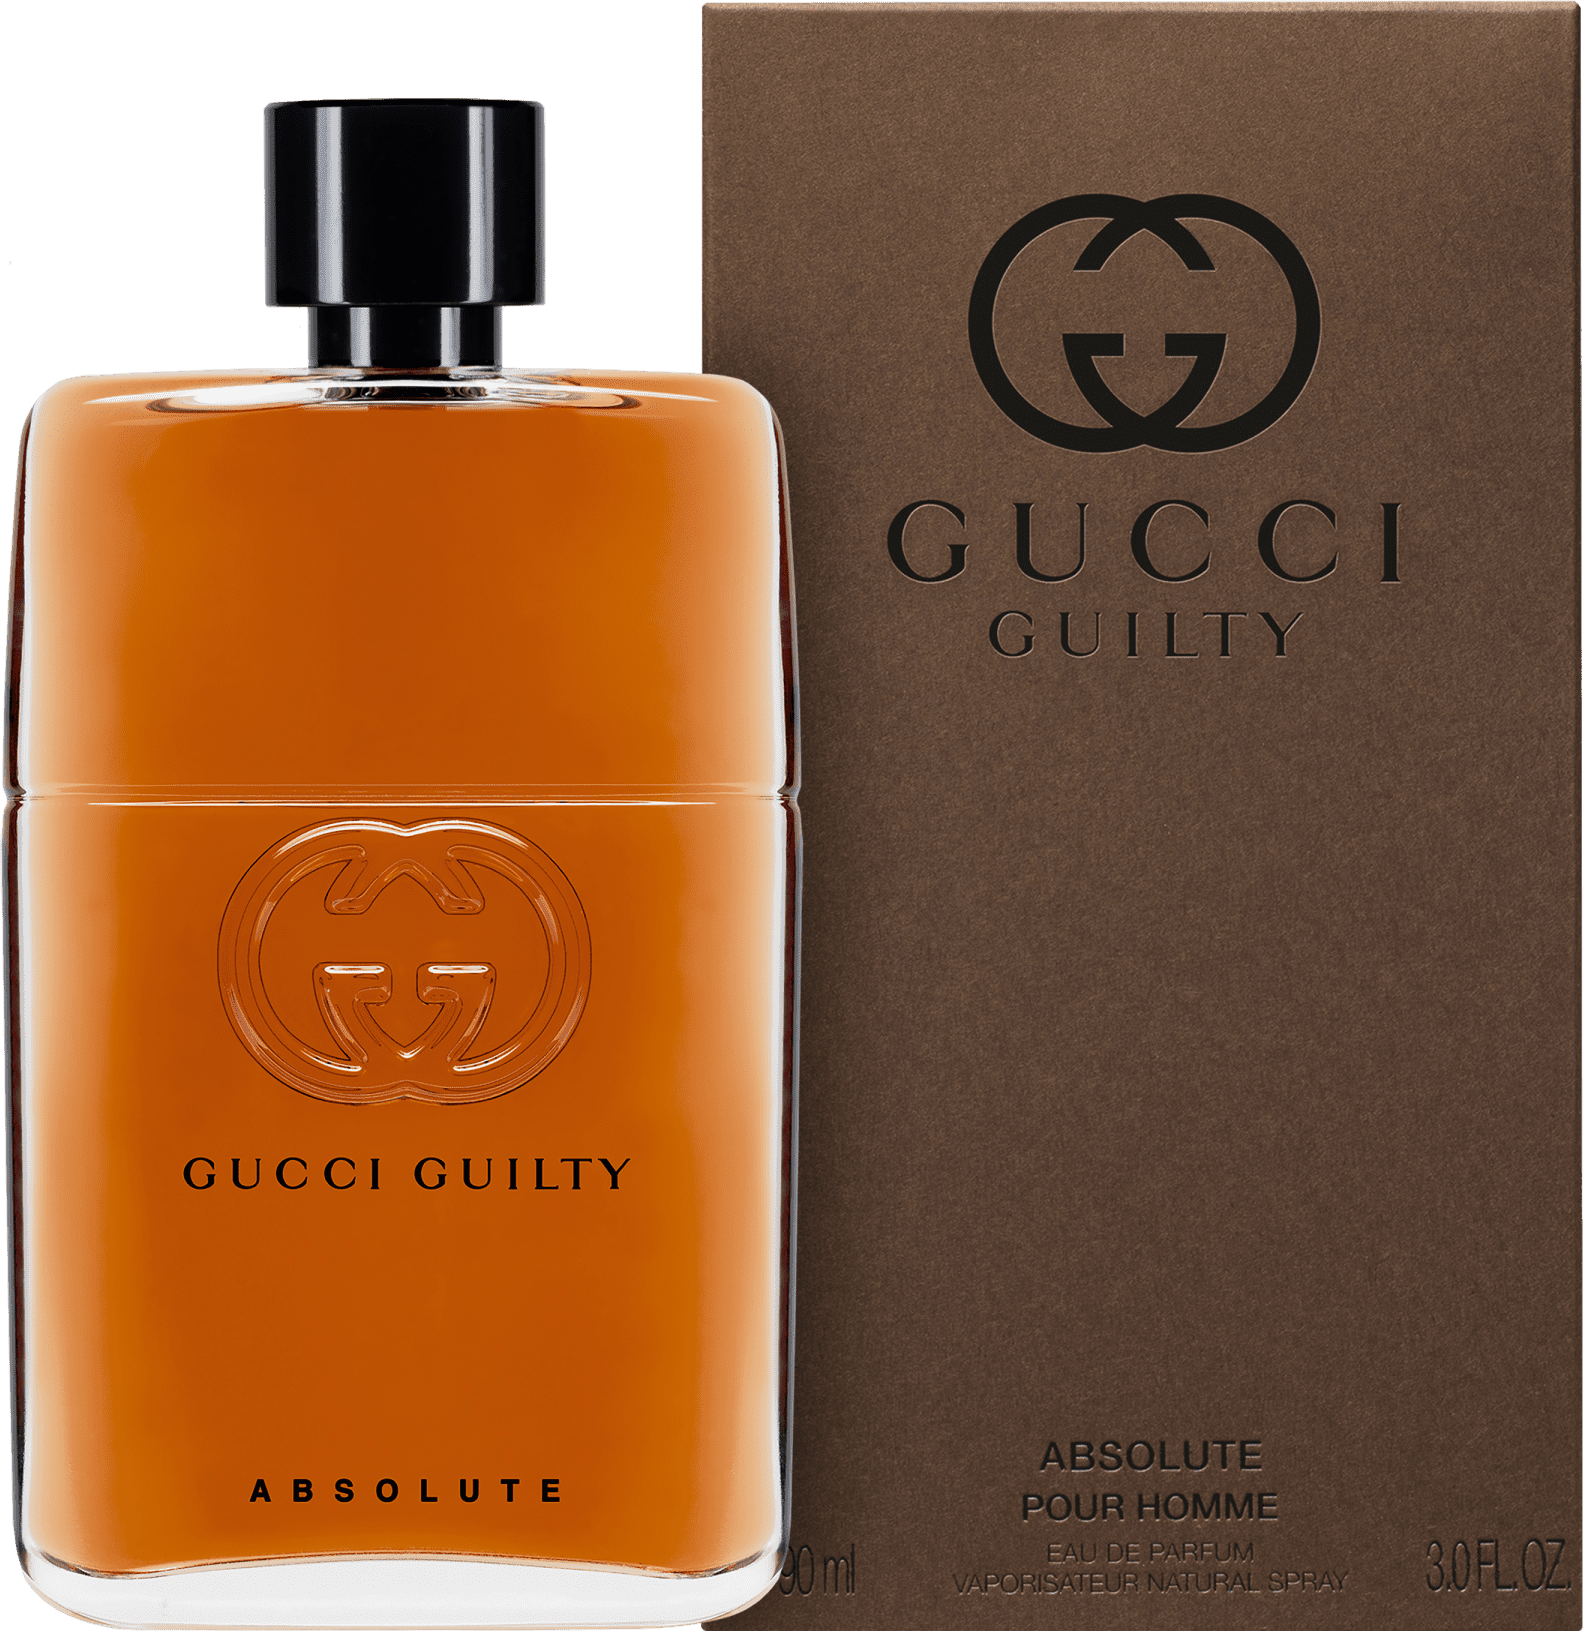 Resultado de imagem para Gucci Guilty Absolute